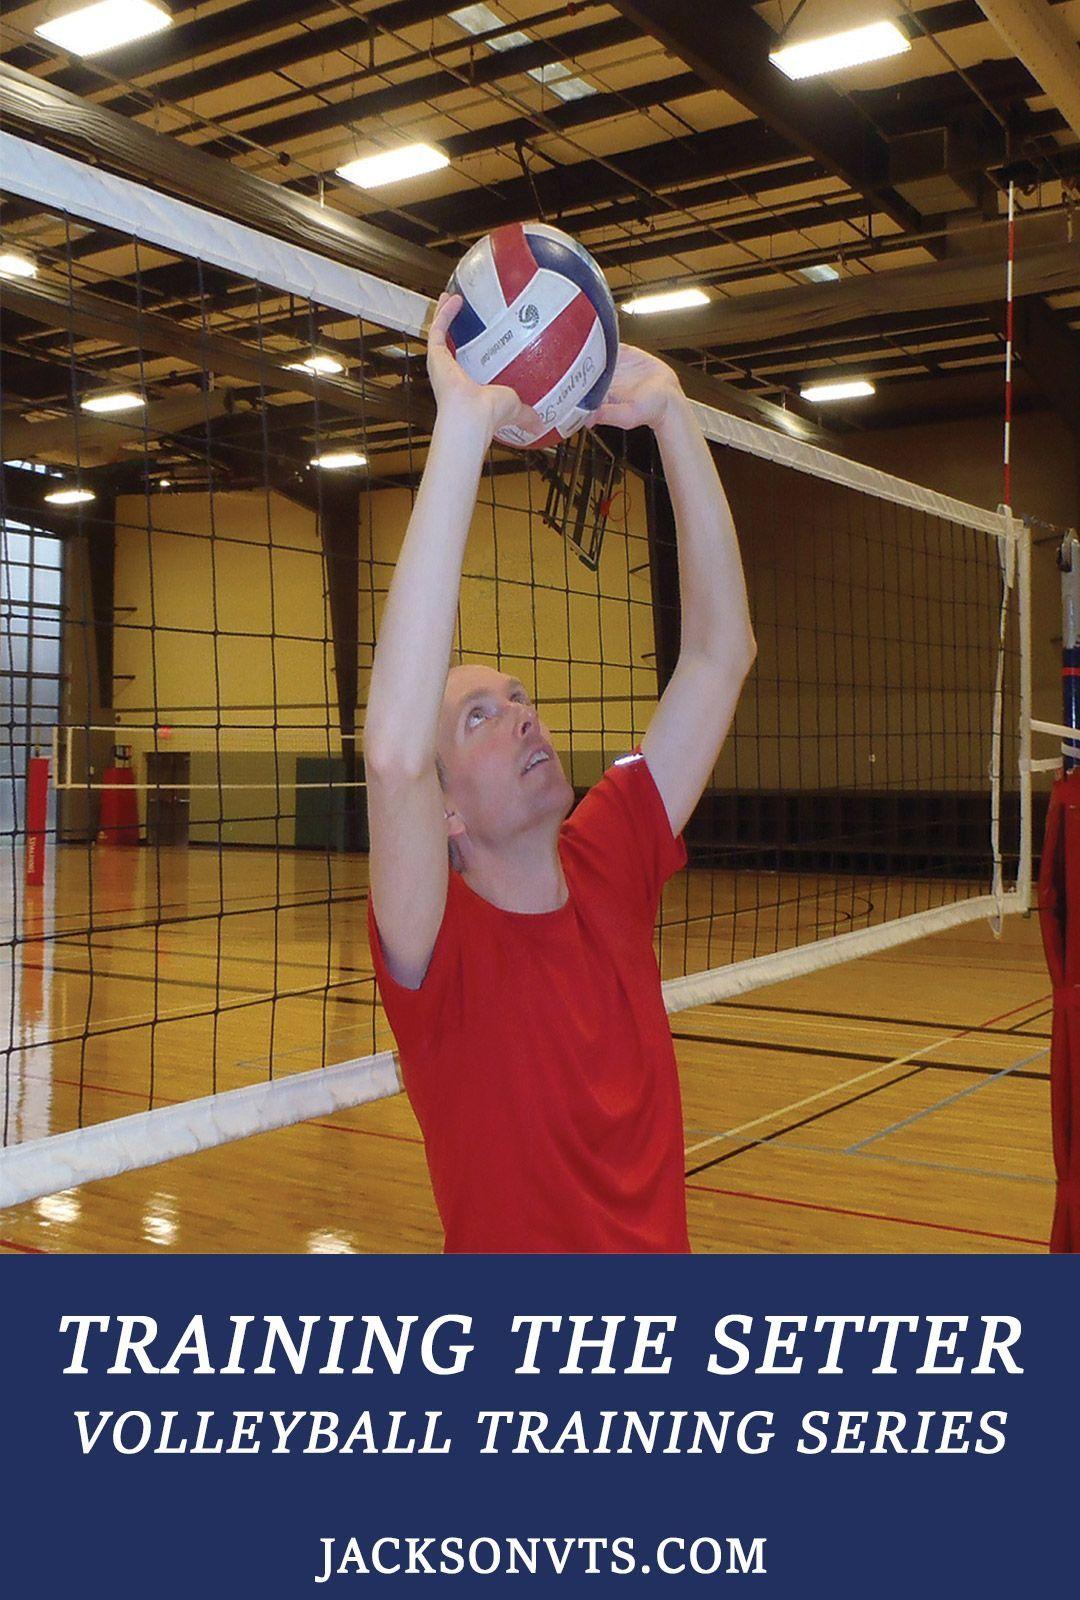 Volleyball Setting Drills Usually Involve Setting Balls From A Coaches Toss Or From Player Con Imagenes Entrenar Voleibol Taladros Del Voleibol Entrenamientos De Baloncesto